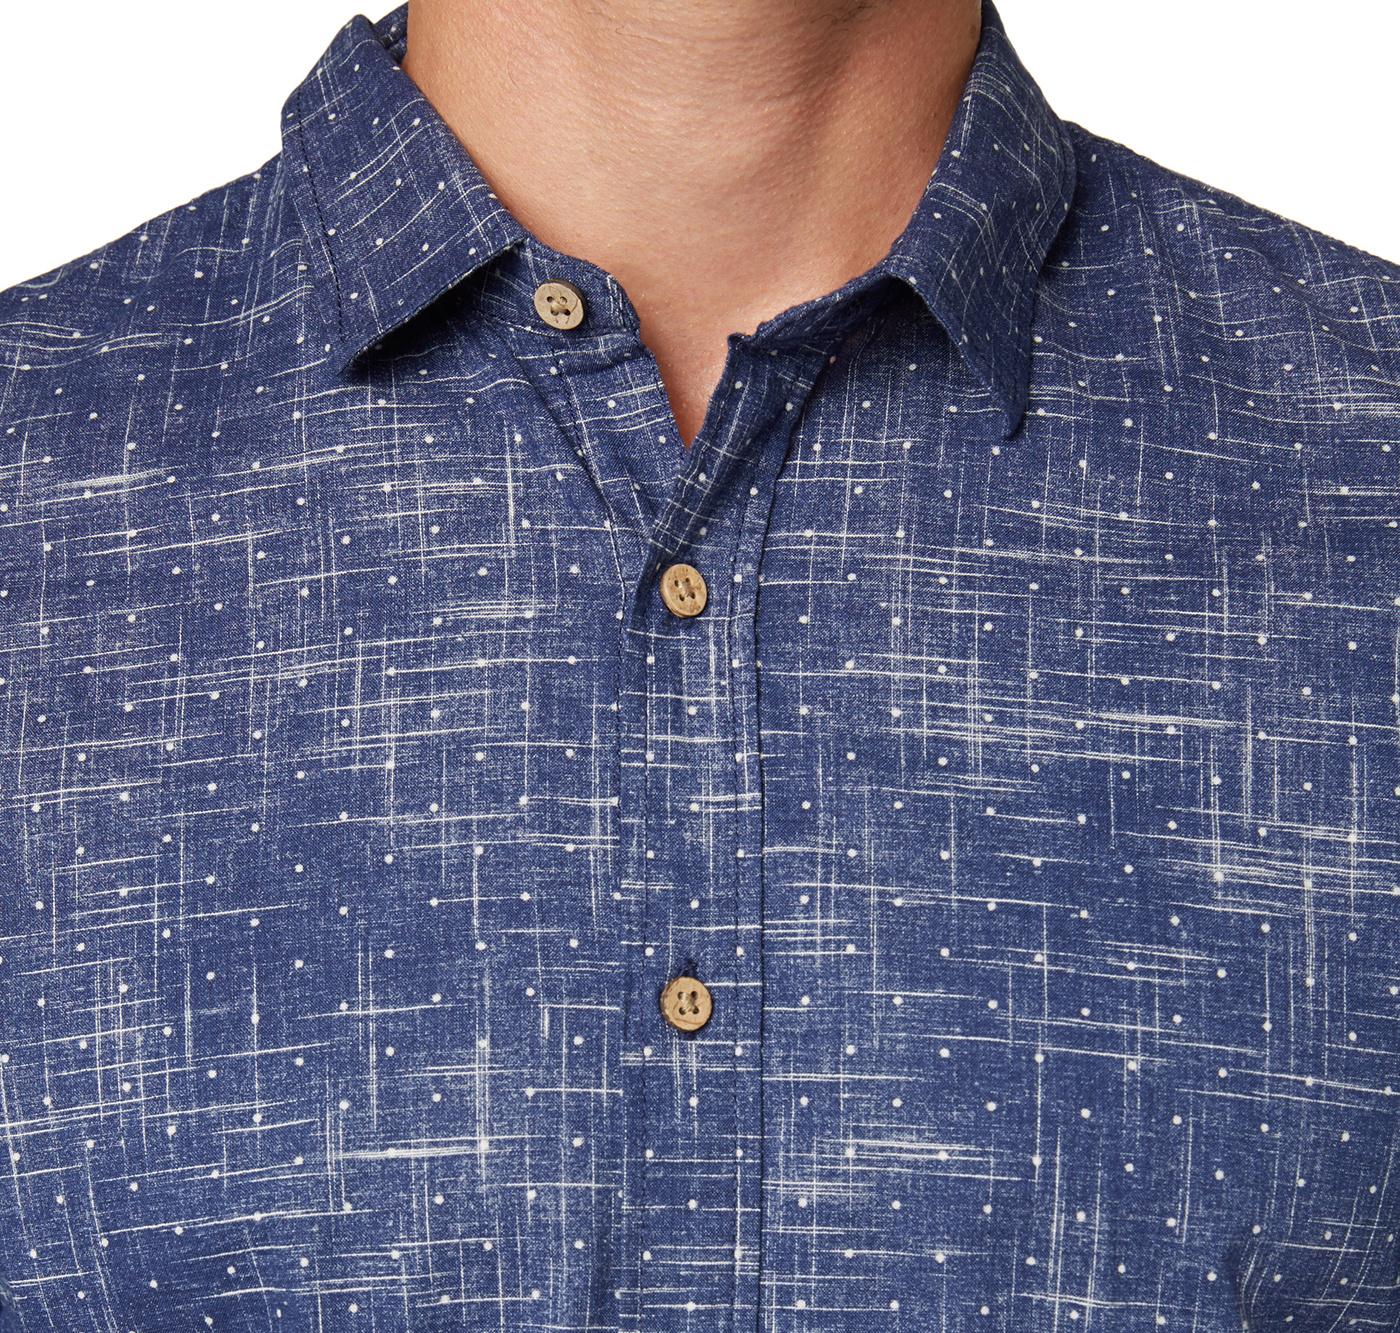 textile design  ILLUSTRATION